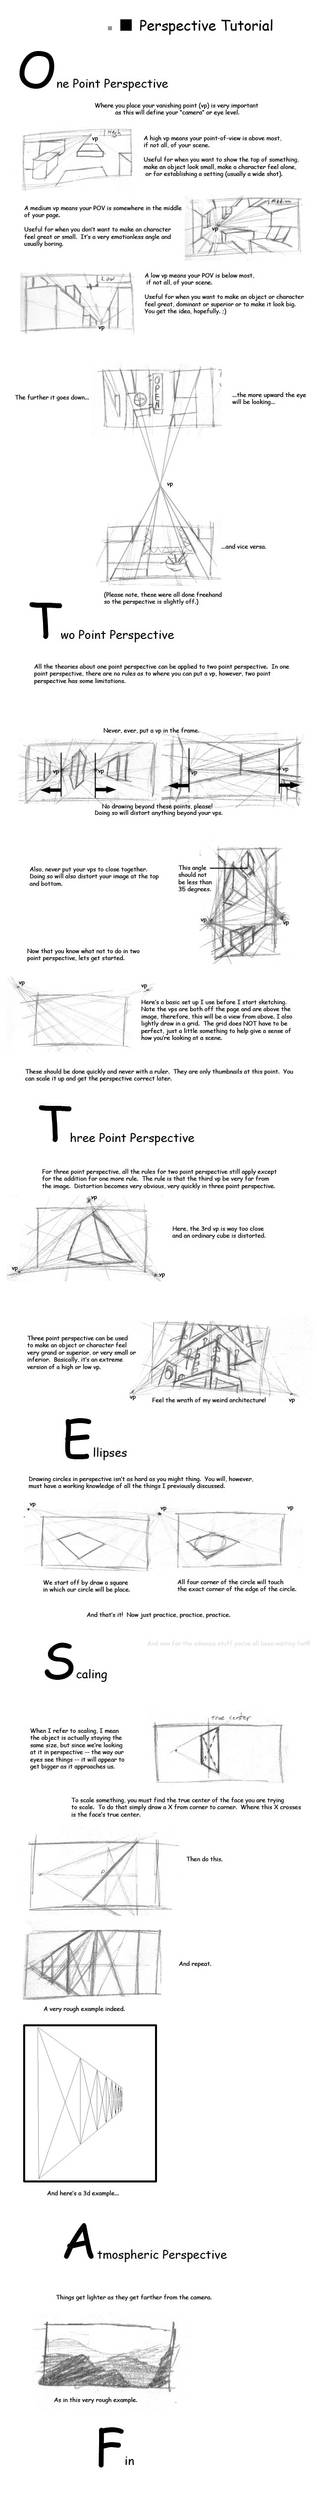 Perspective Tutorial